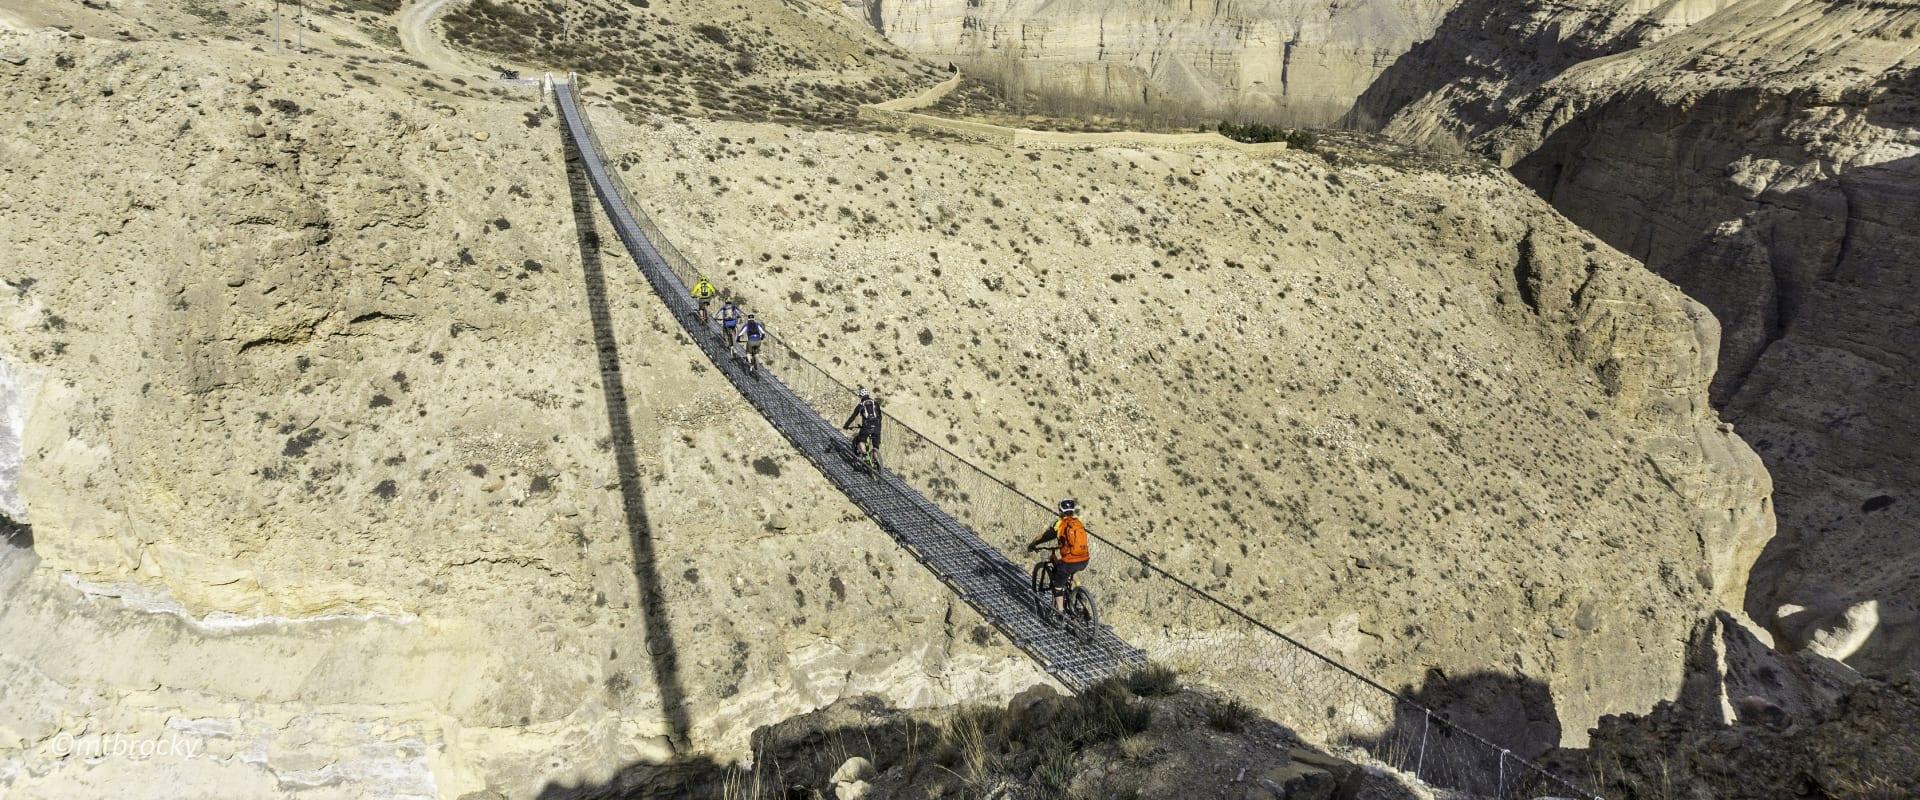 Getting An Adrenaline Rush On Mountain Biking